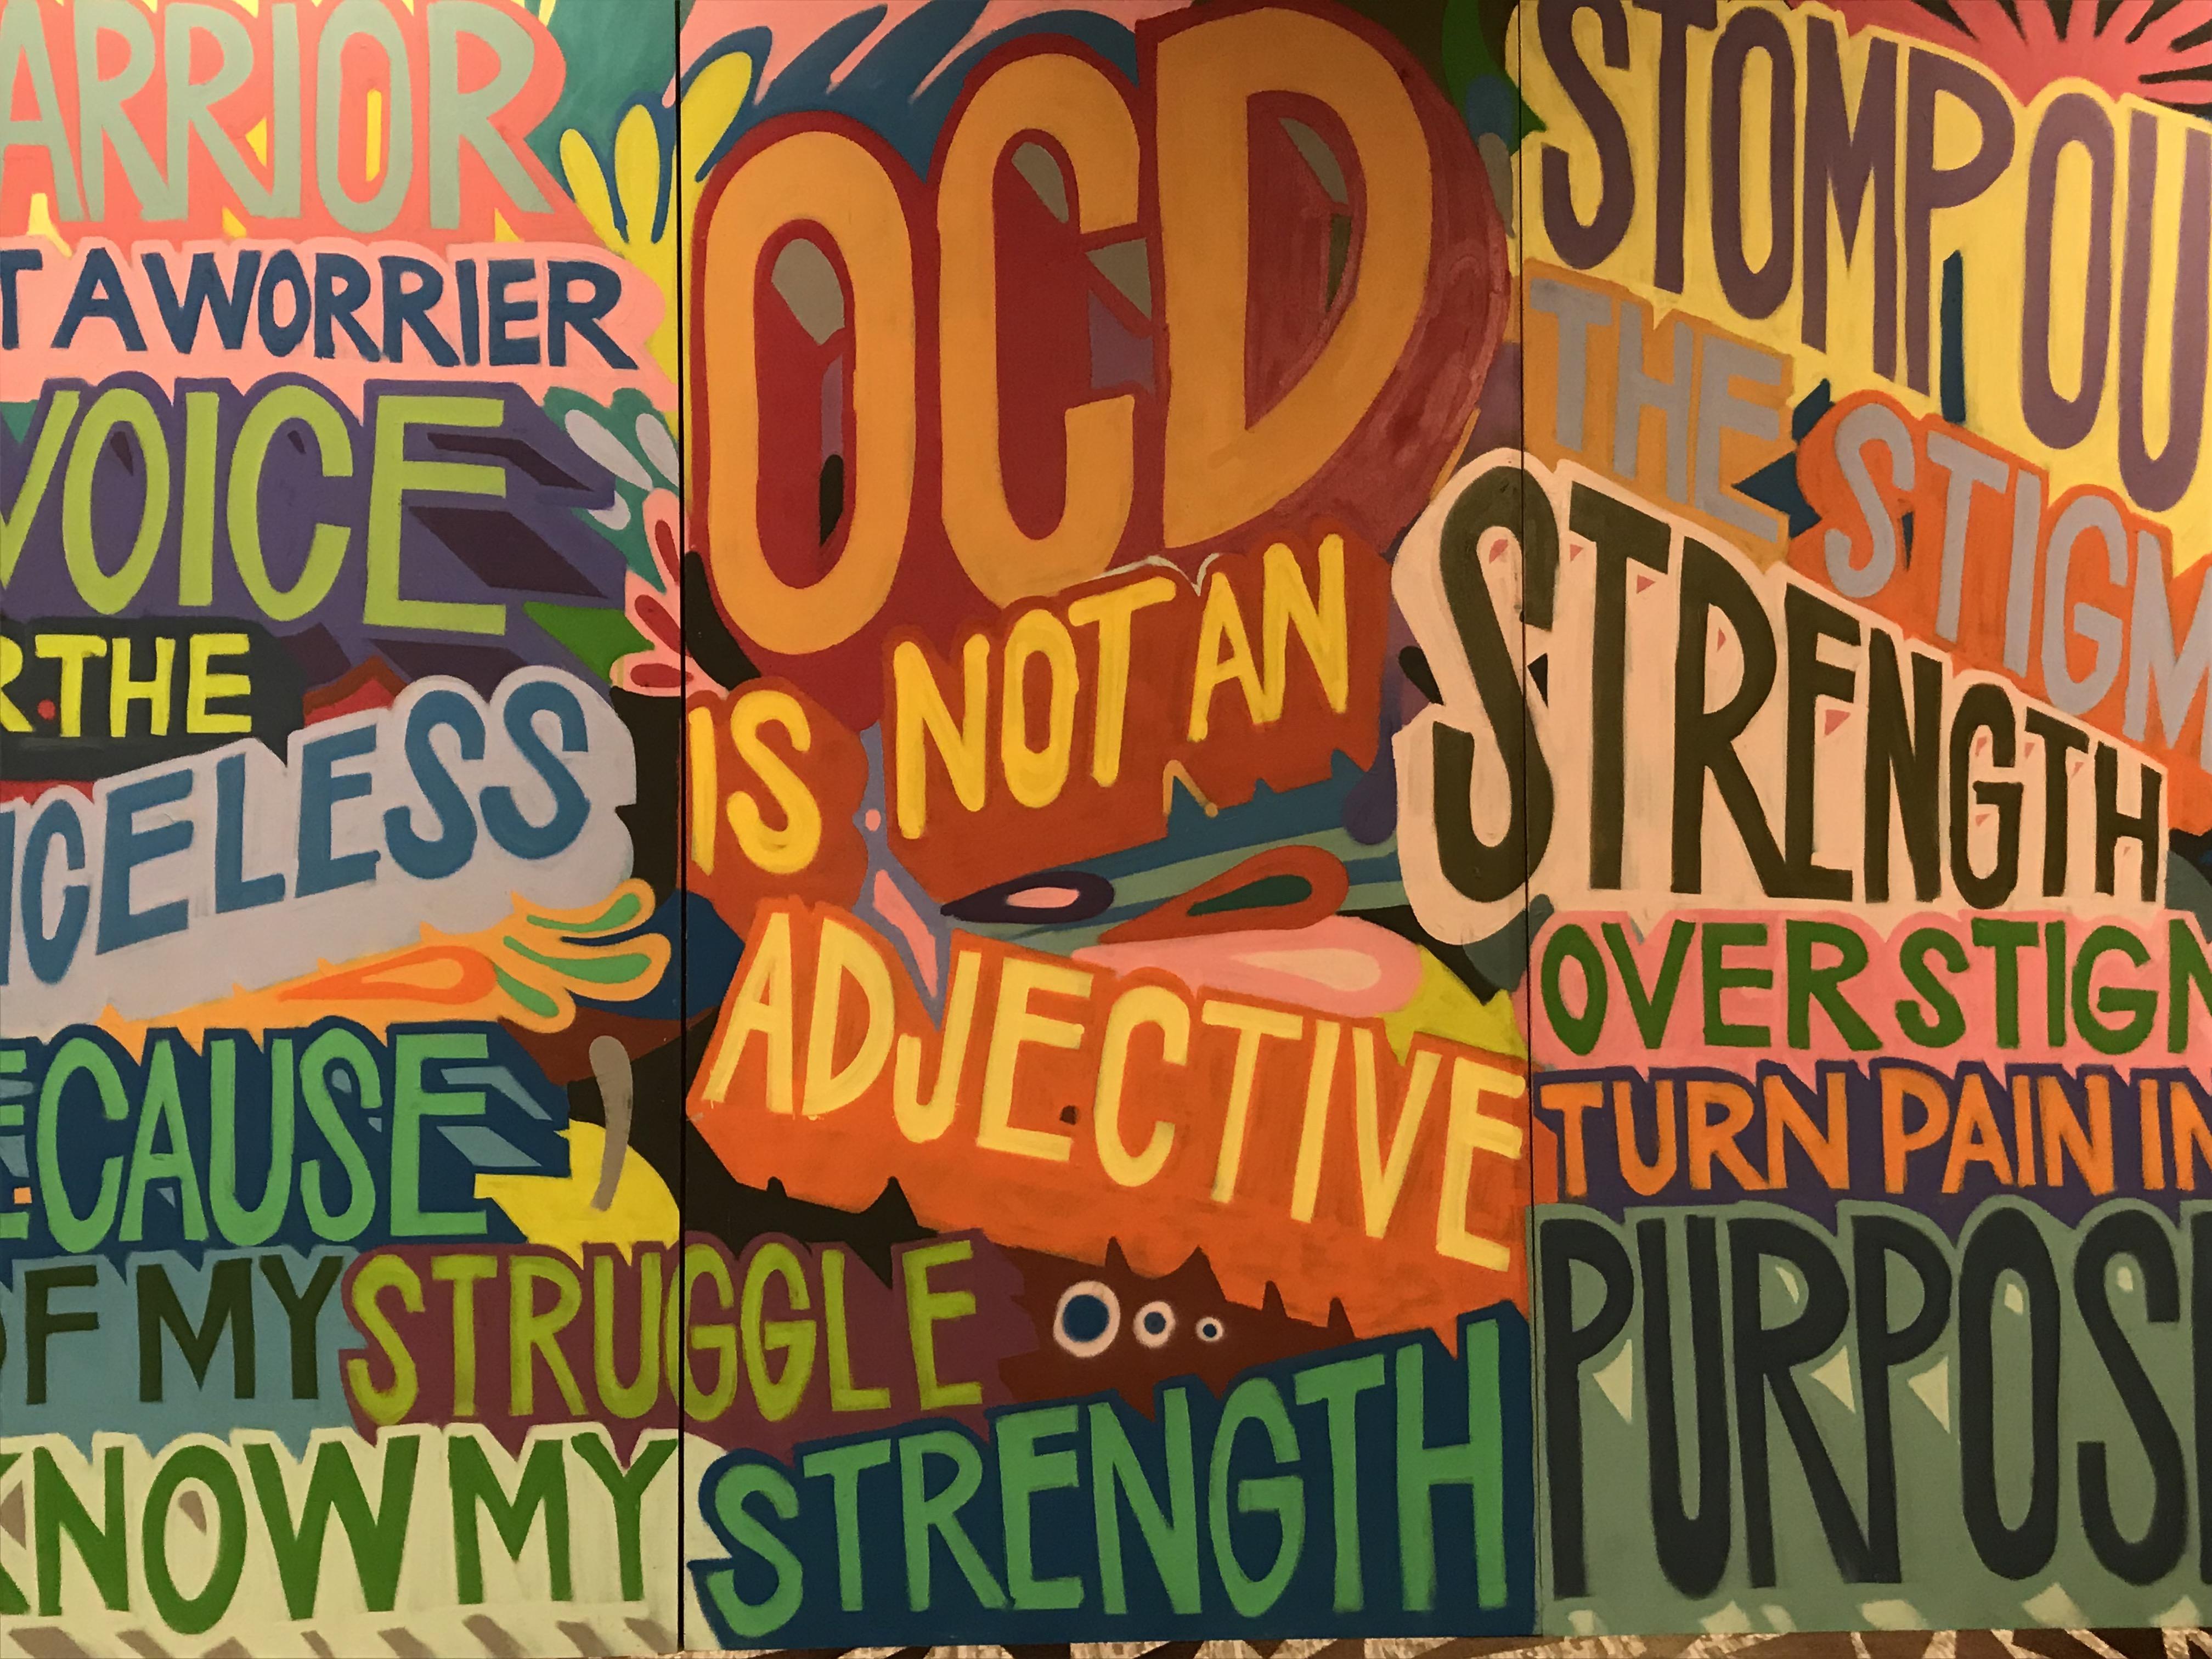 OCD is not an adjective